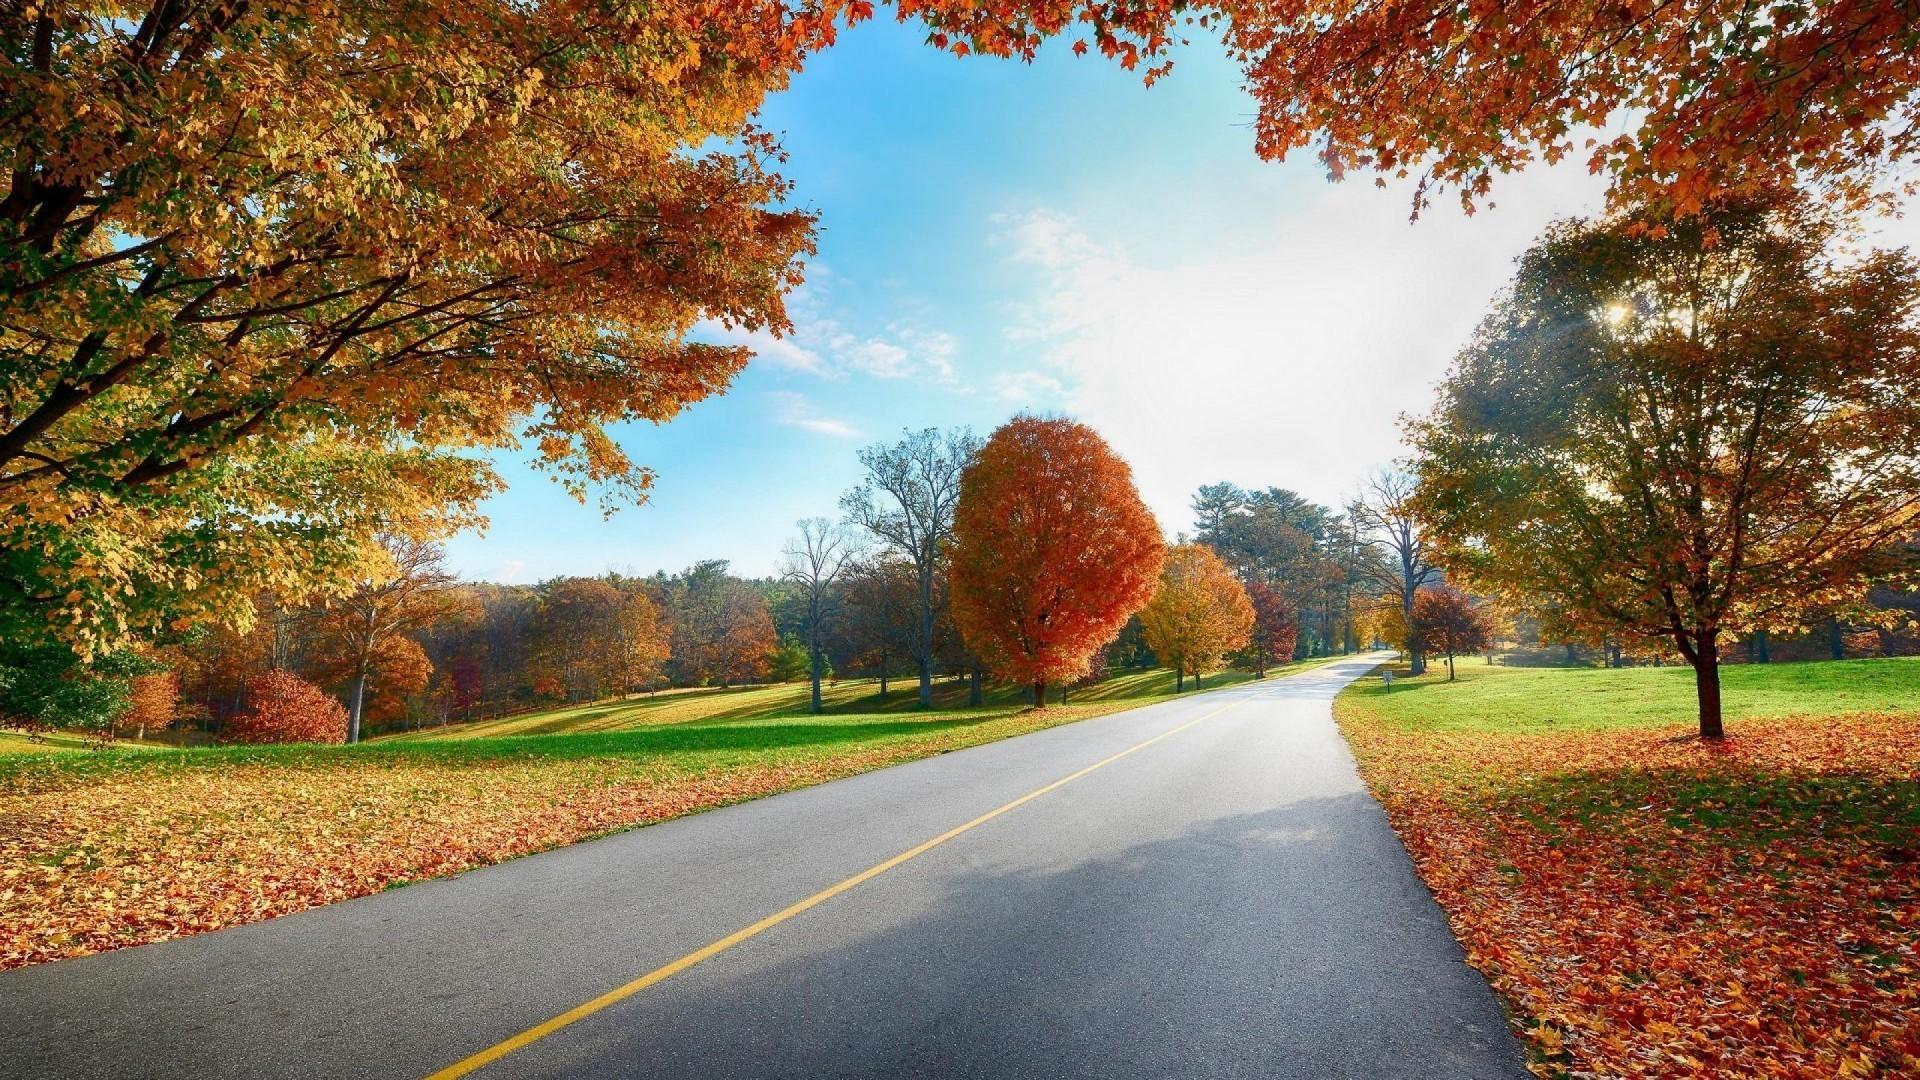 HD images 1080p nature autumn.